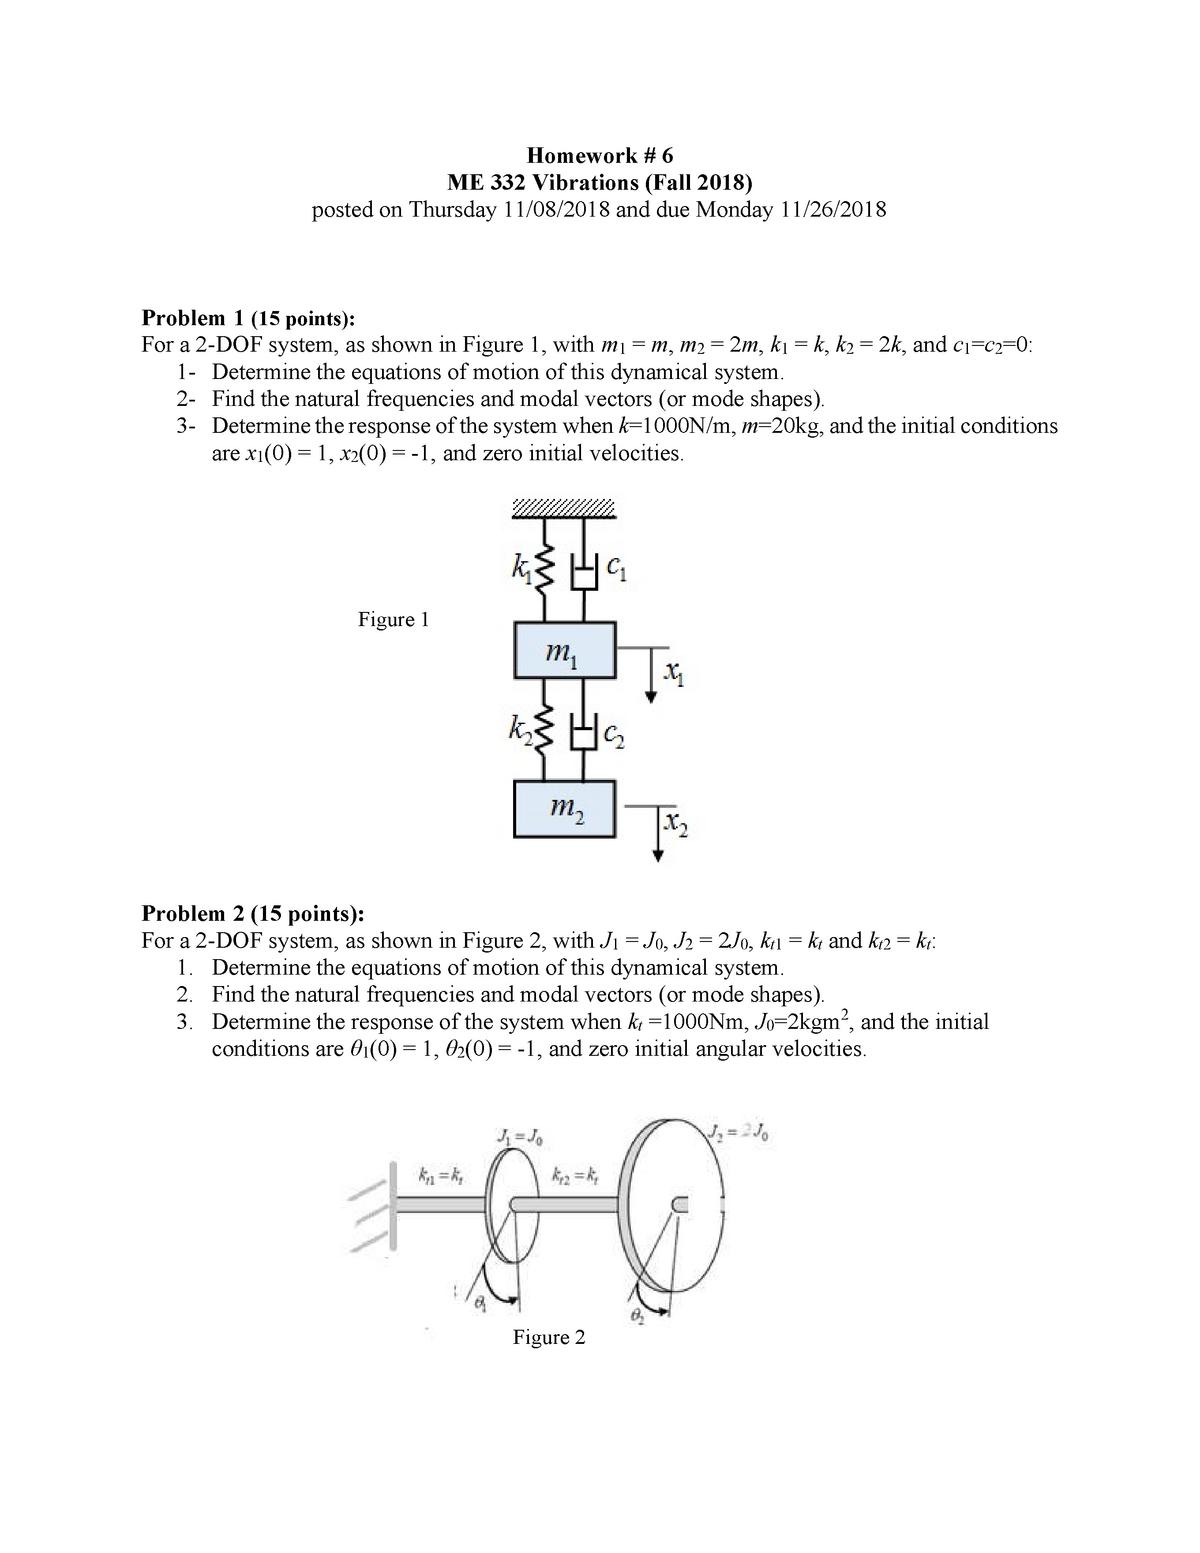 ME332HW06-Abdelkefi - HW 6 - M E 332: Vibrations - StuDocu